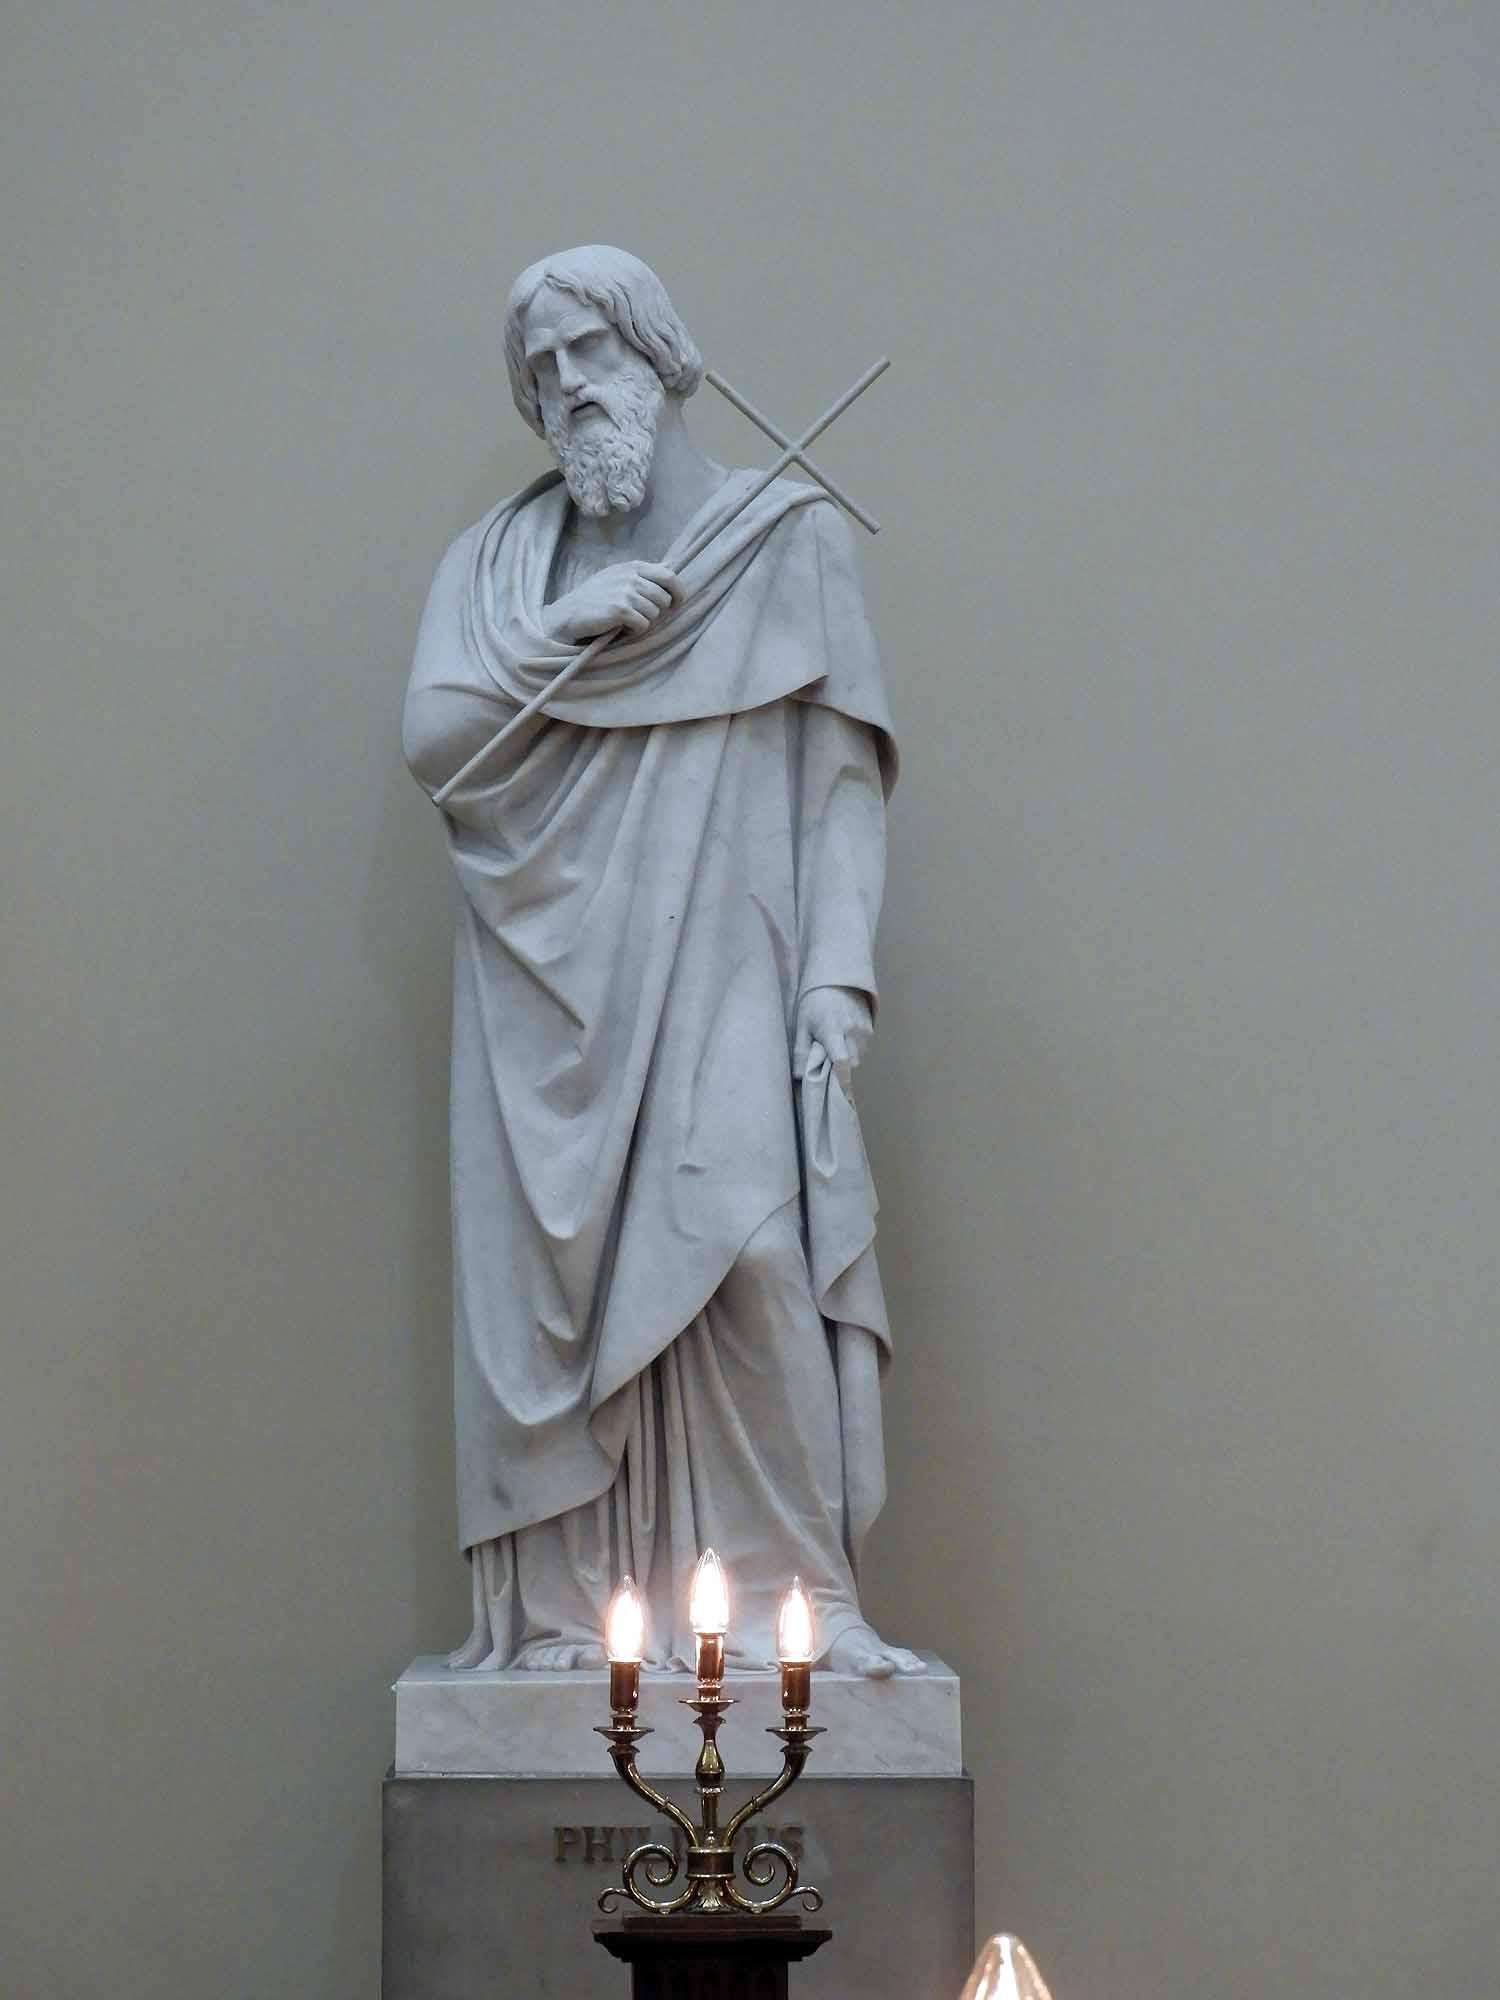 denmark-copenhagen-vor-frue-kirke-cathederal-apostle -philipus-phillip.JPG